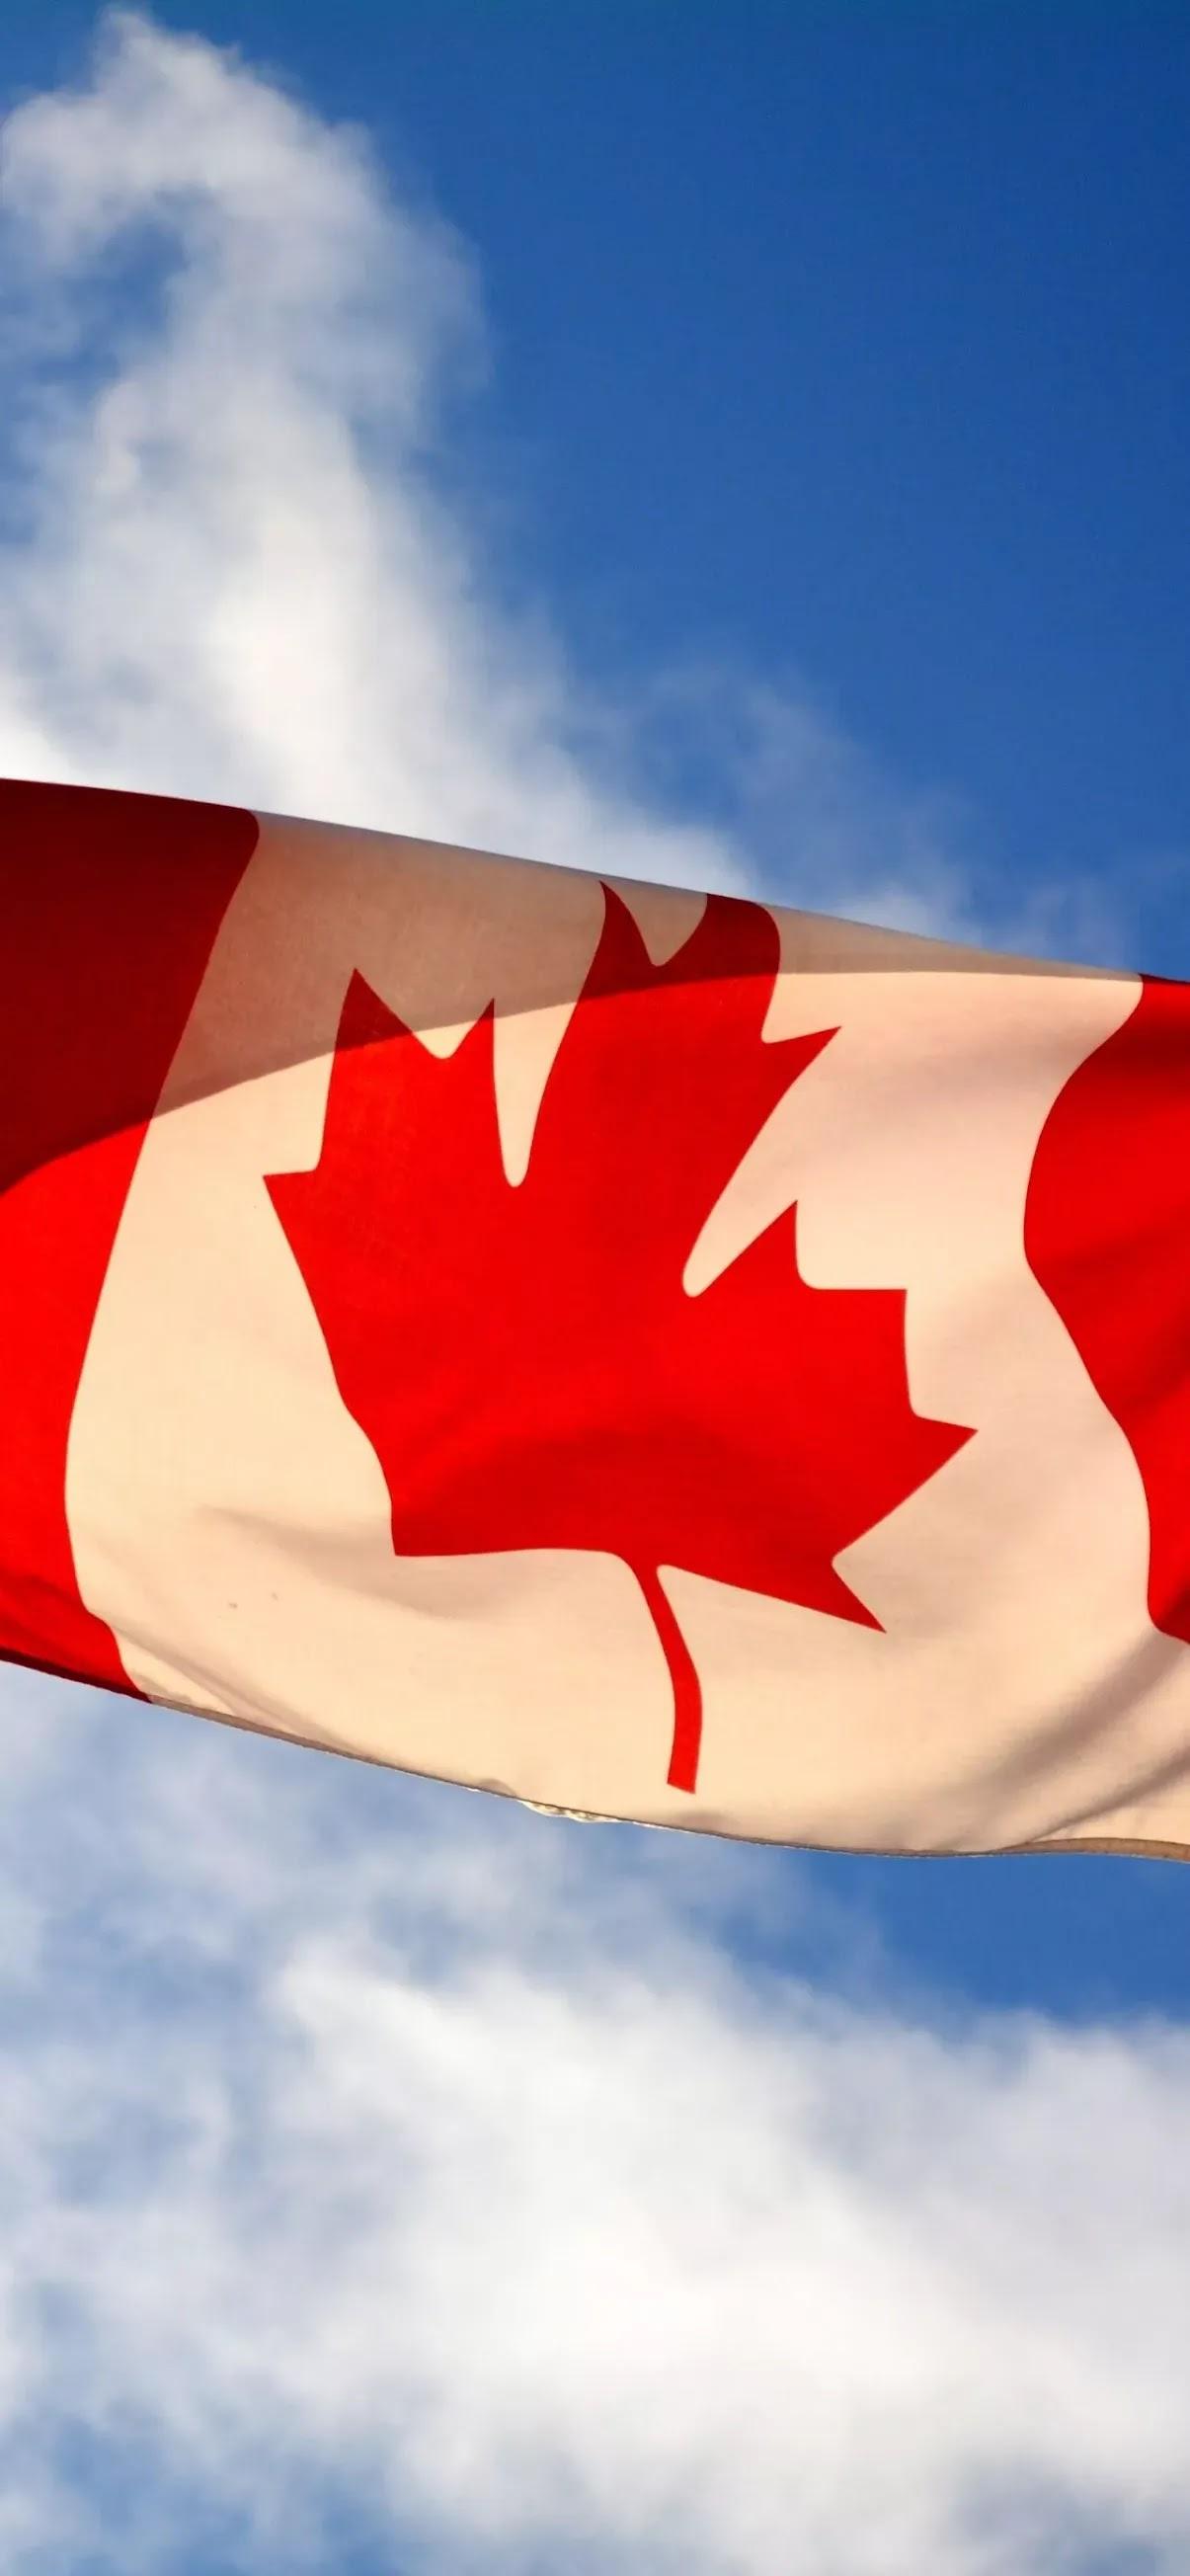 Canada flag image wallpaper